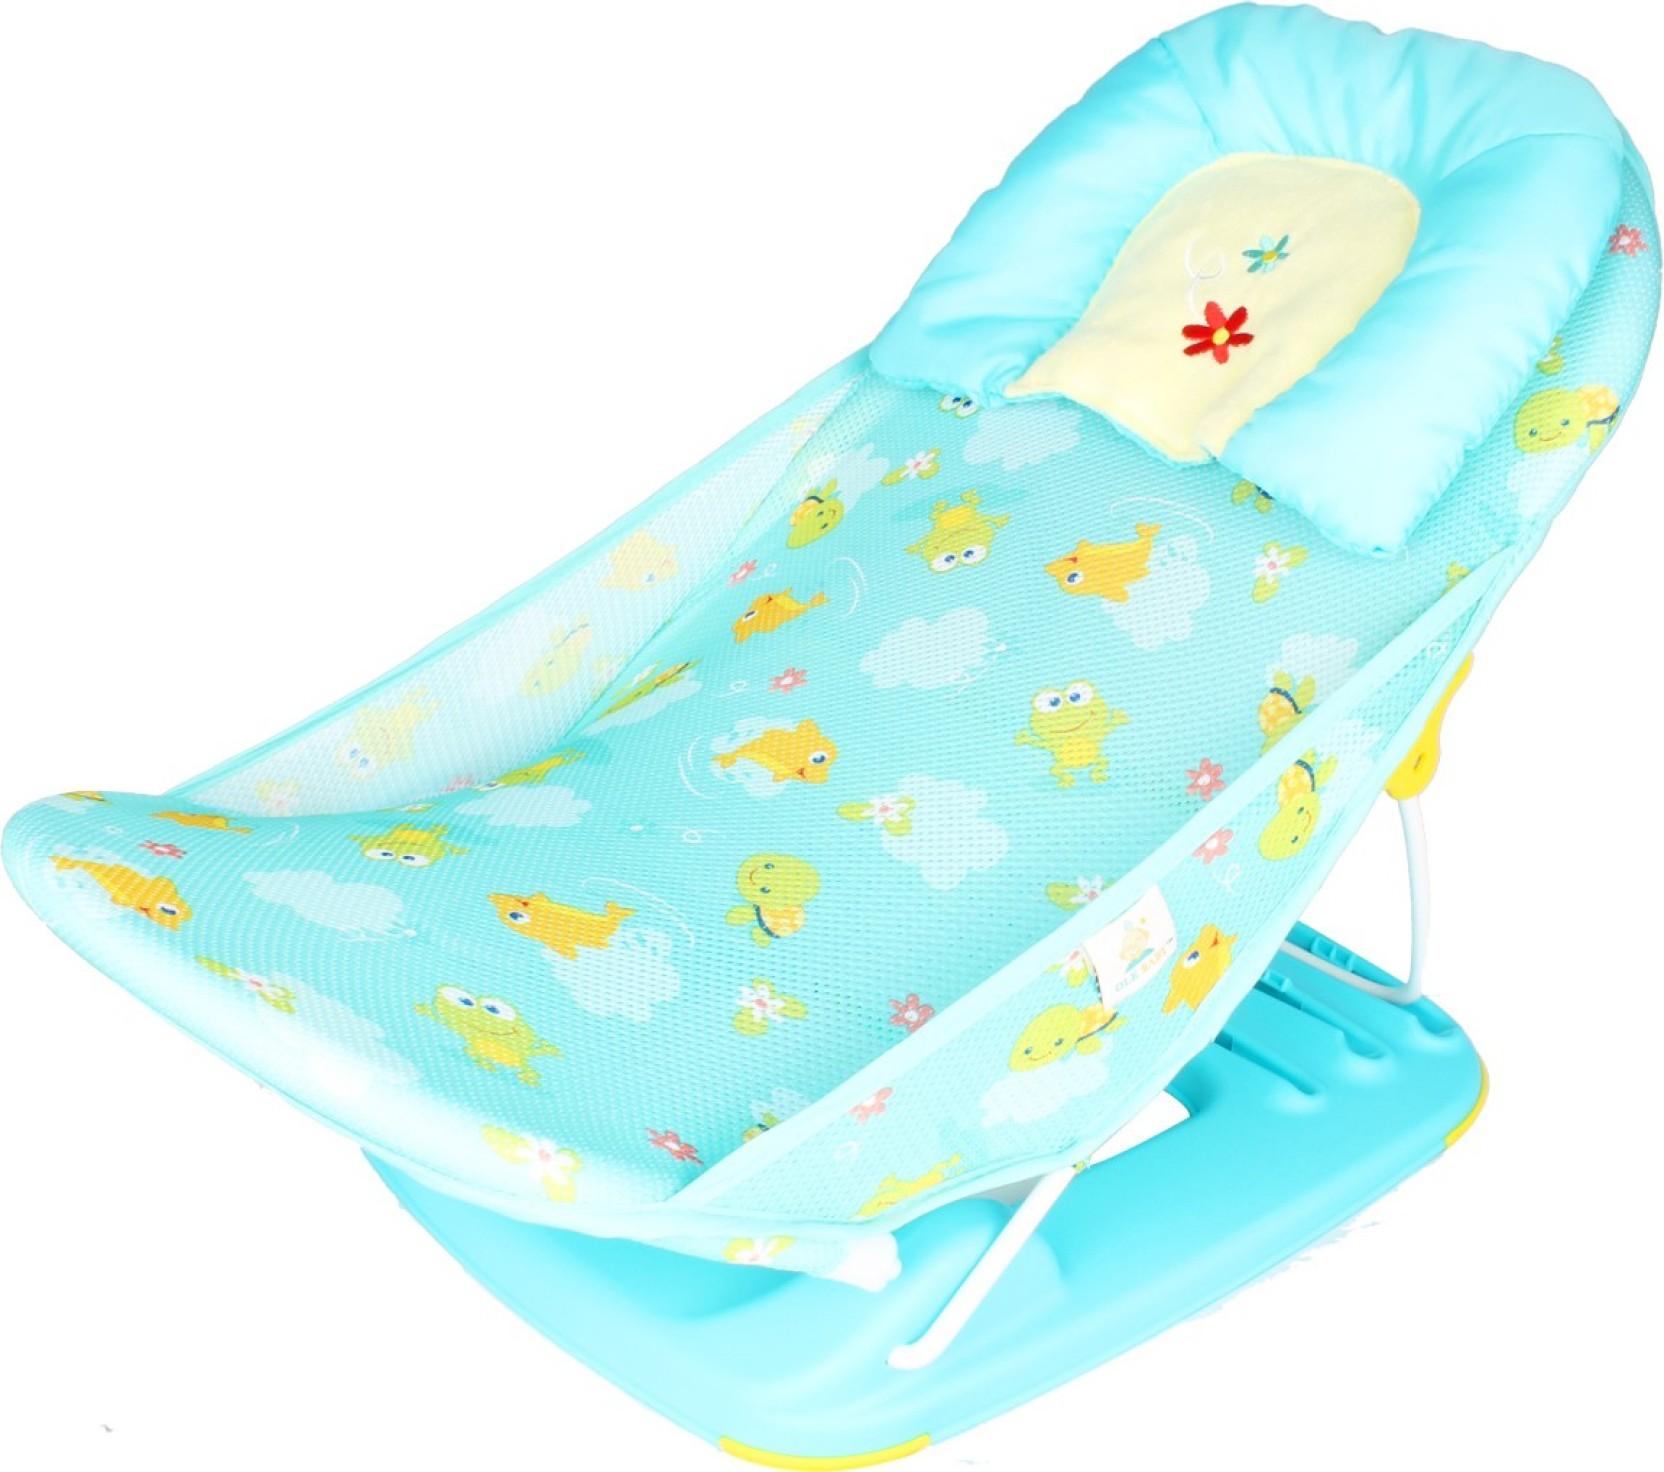 Awesome Deluxe Baby Bath Seat Photos - Bathtub for Bathroom Ideas ...